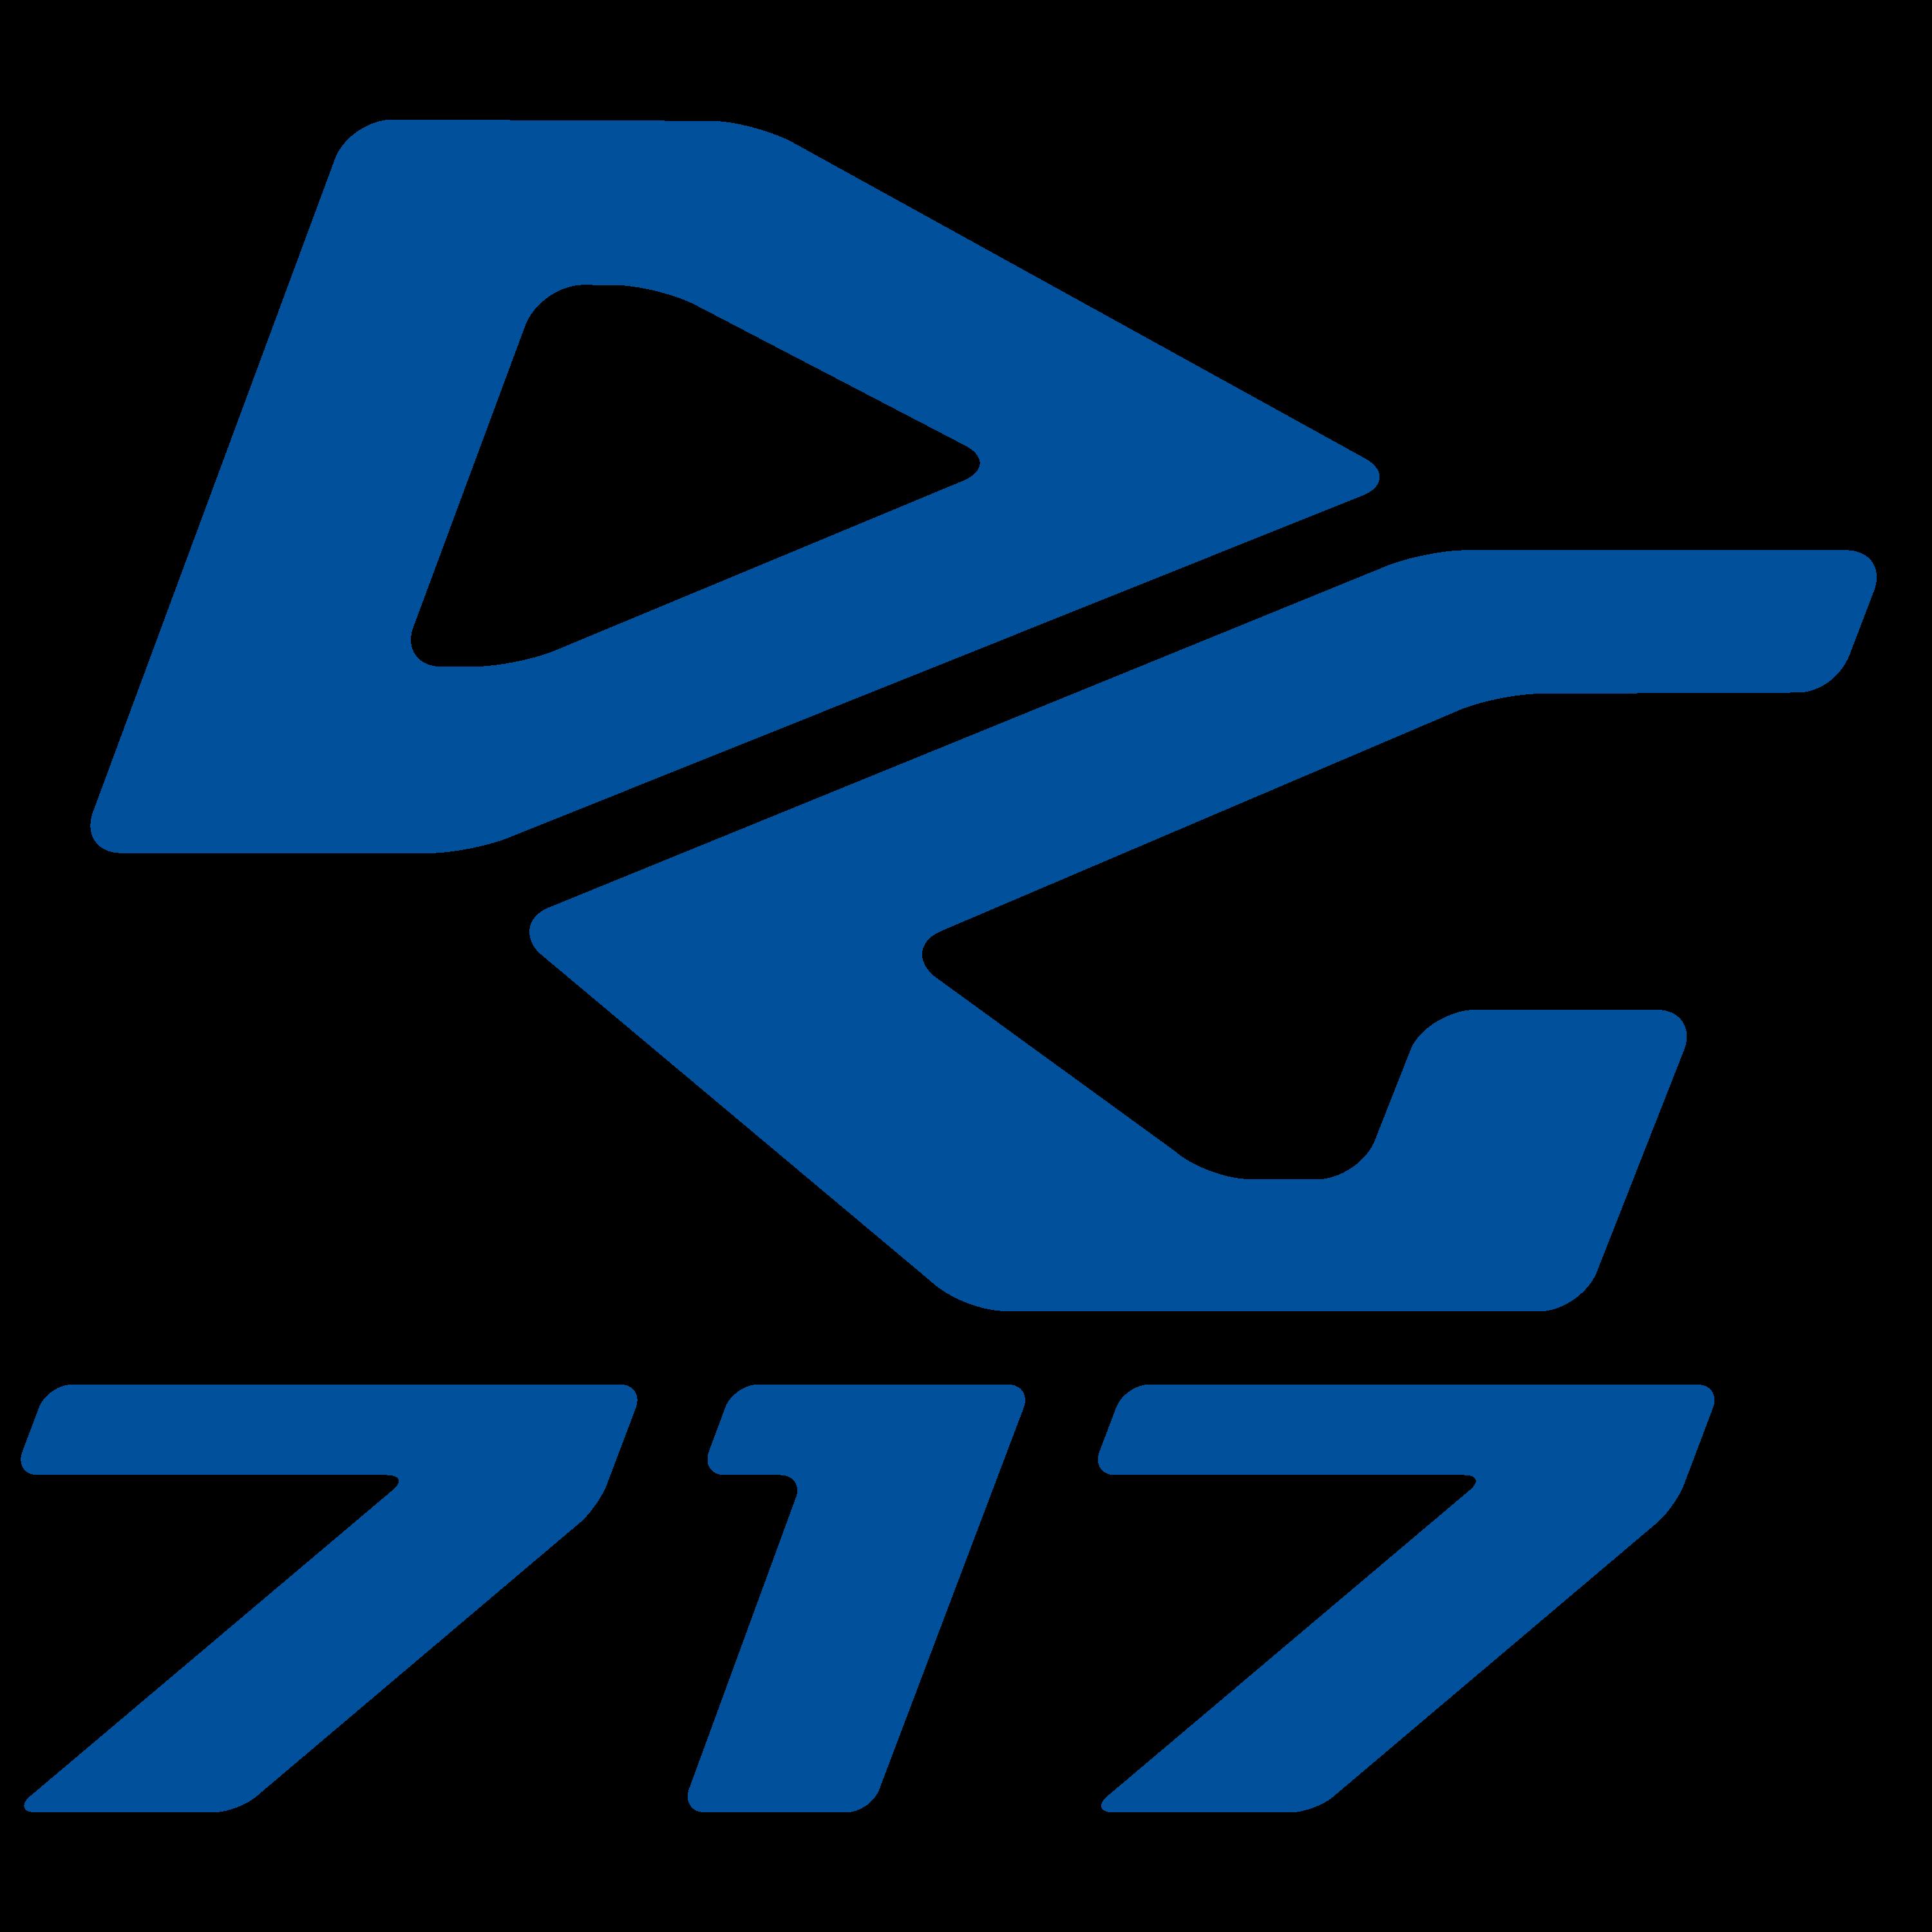 DG717